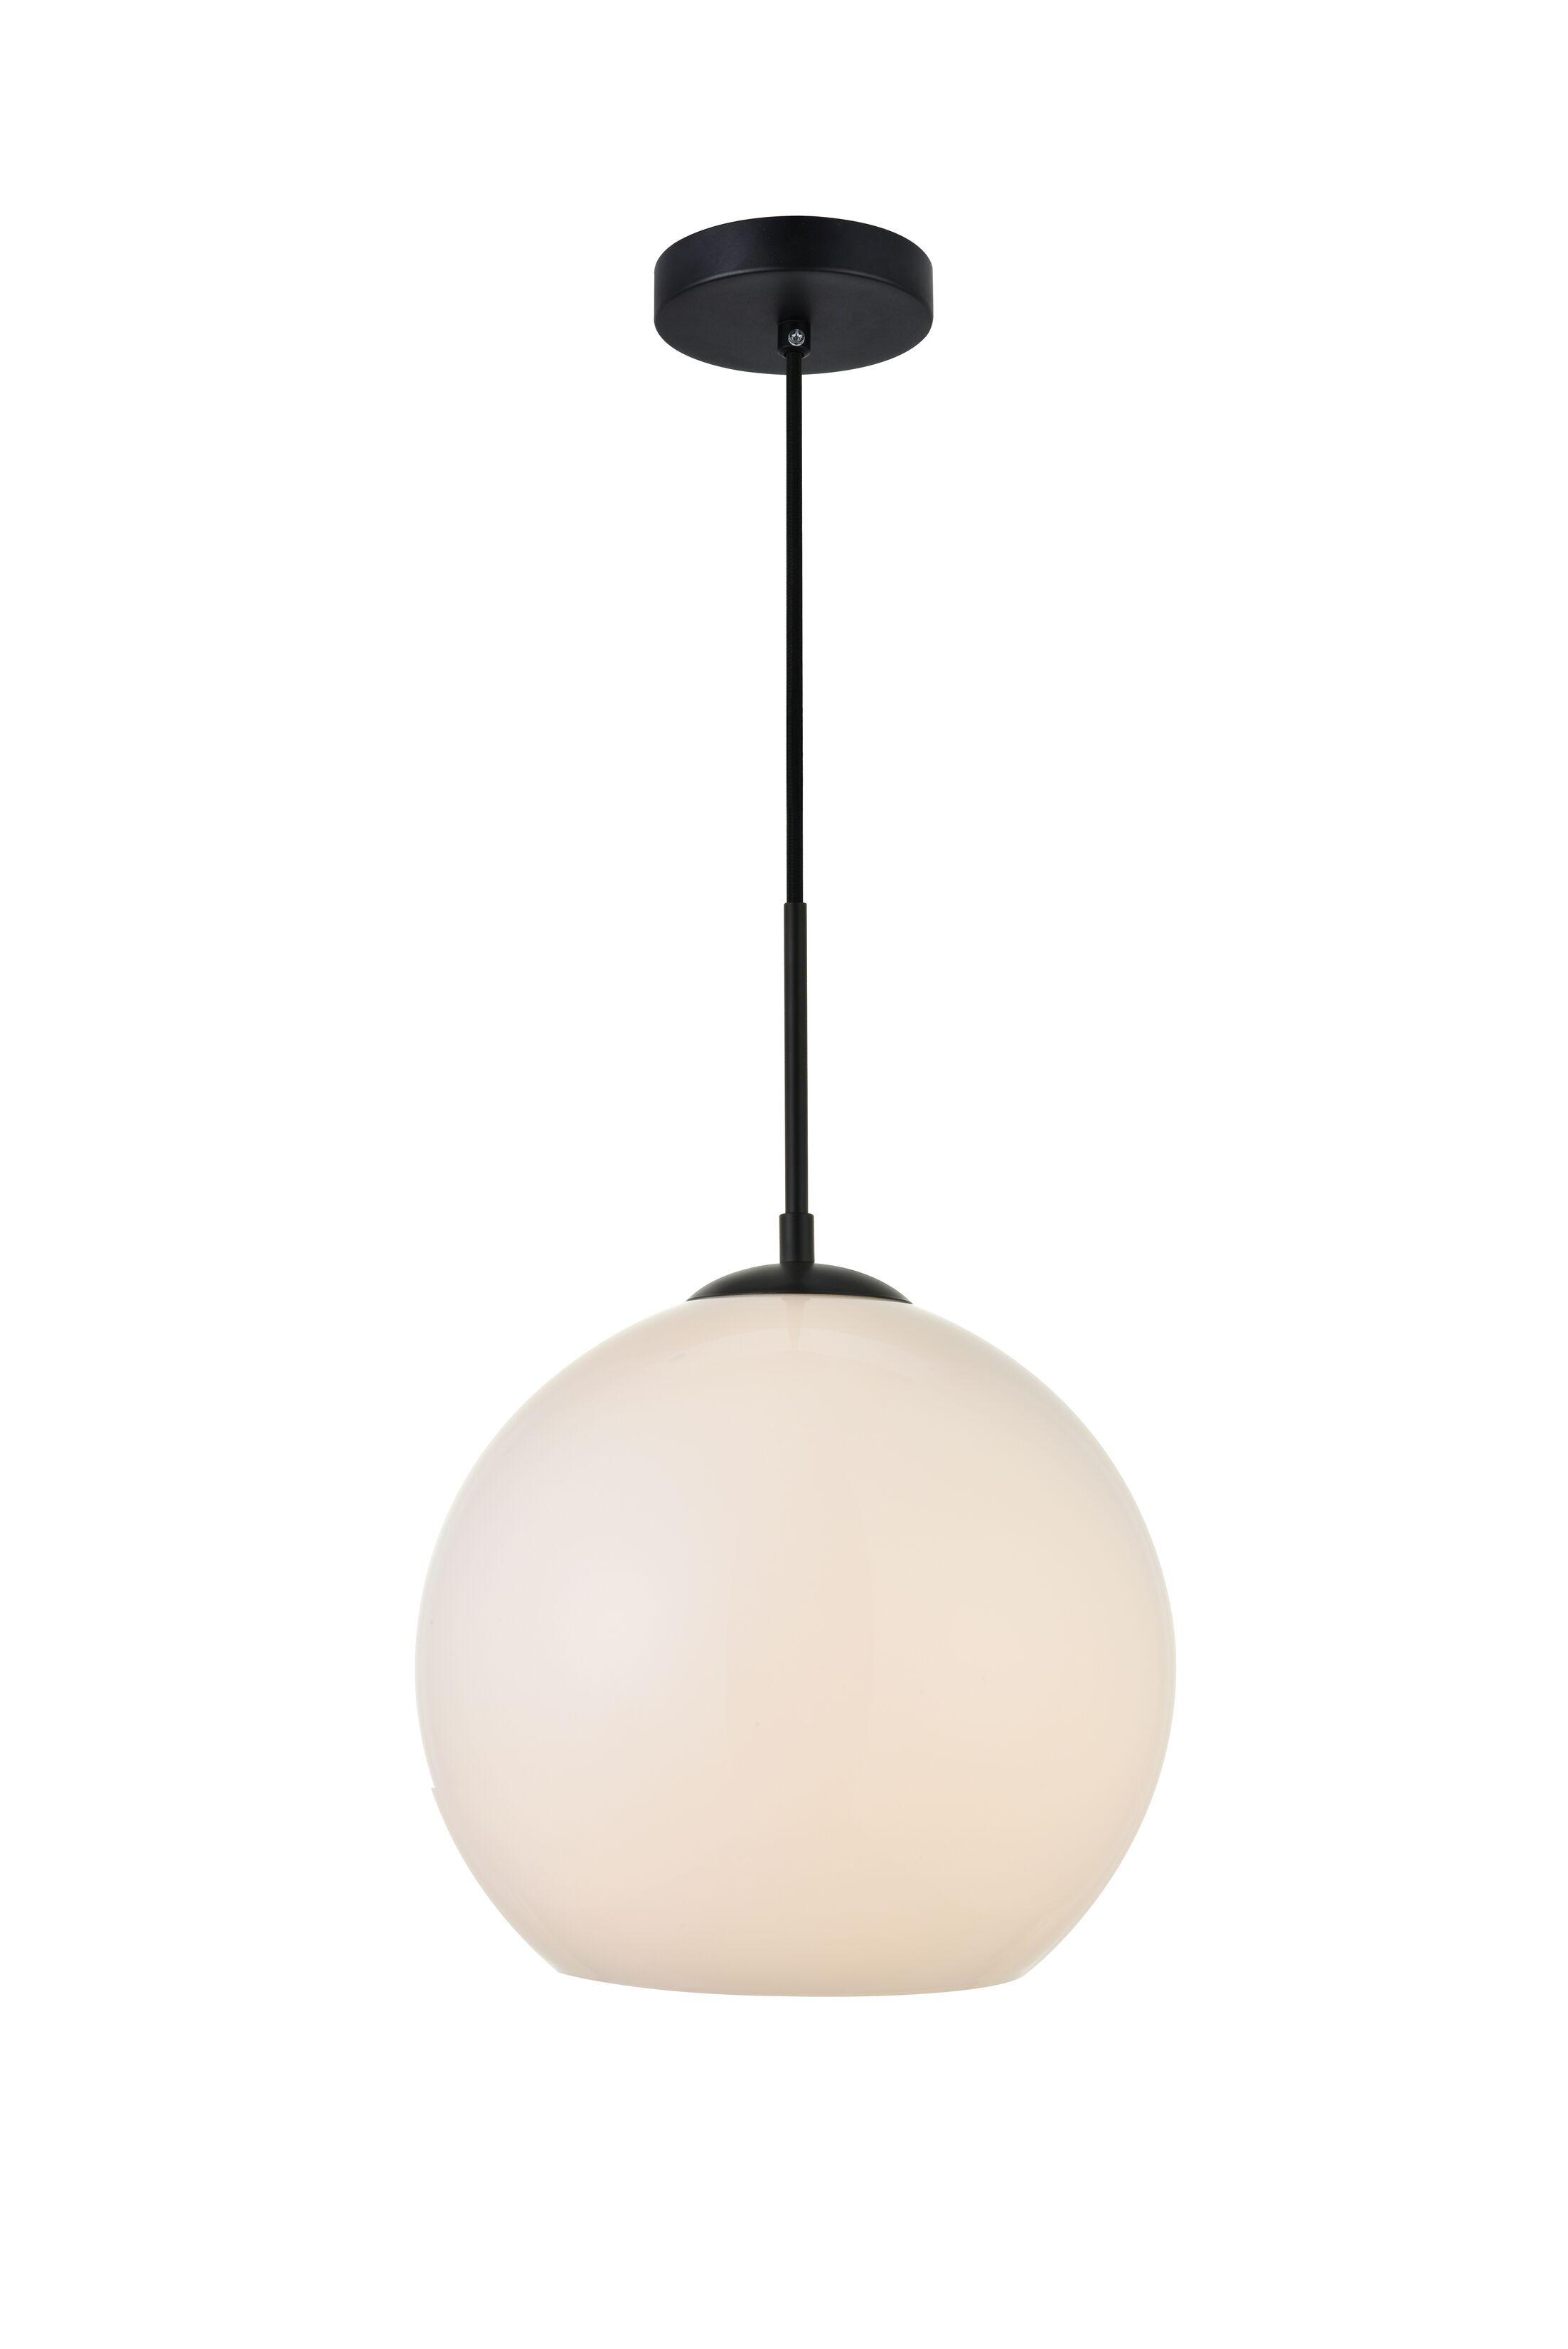 Eller 1-Light Globe Pendant Finish: Black, Shade Color/Pattern: Frosted White, Size: 13.4